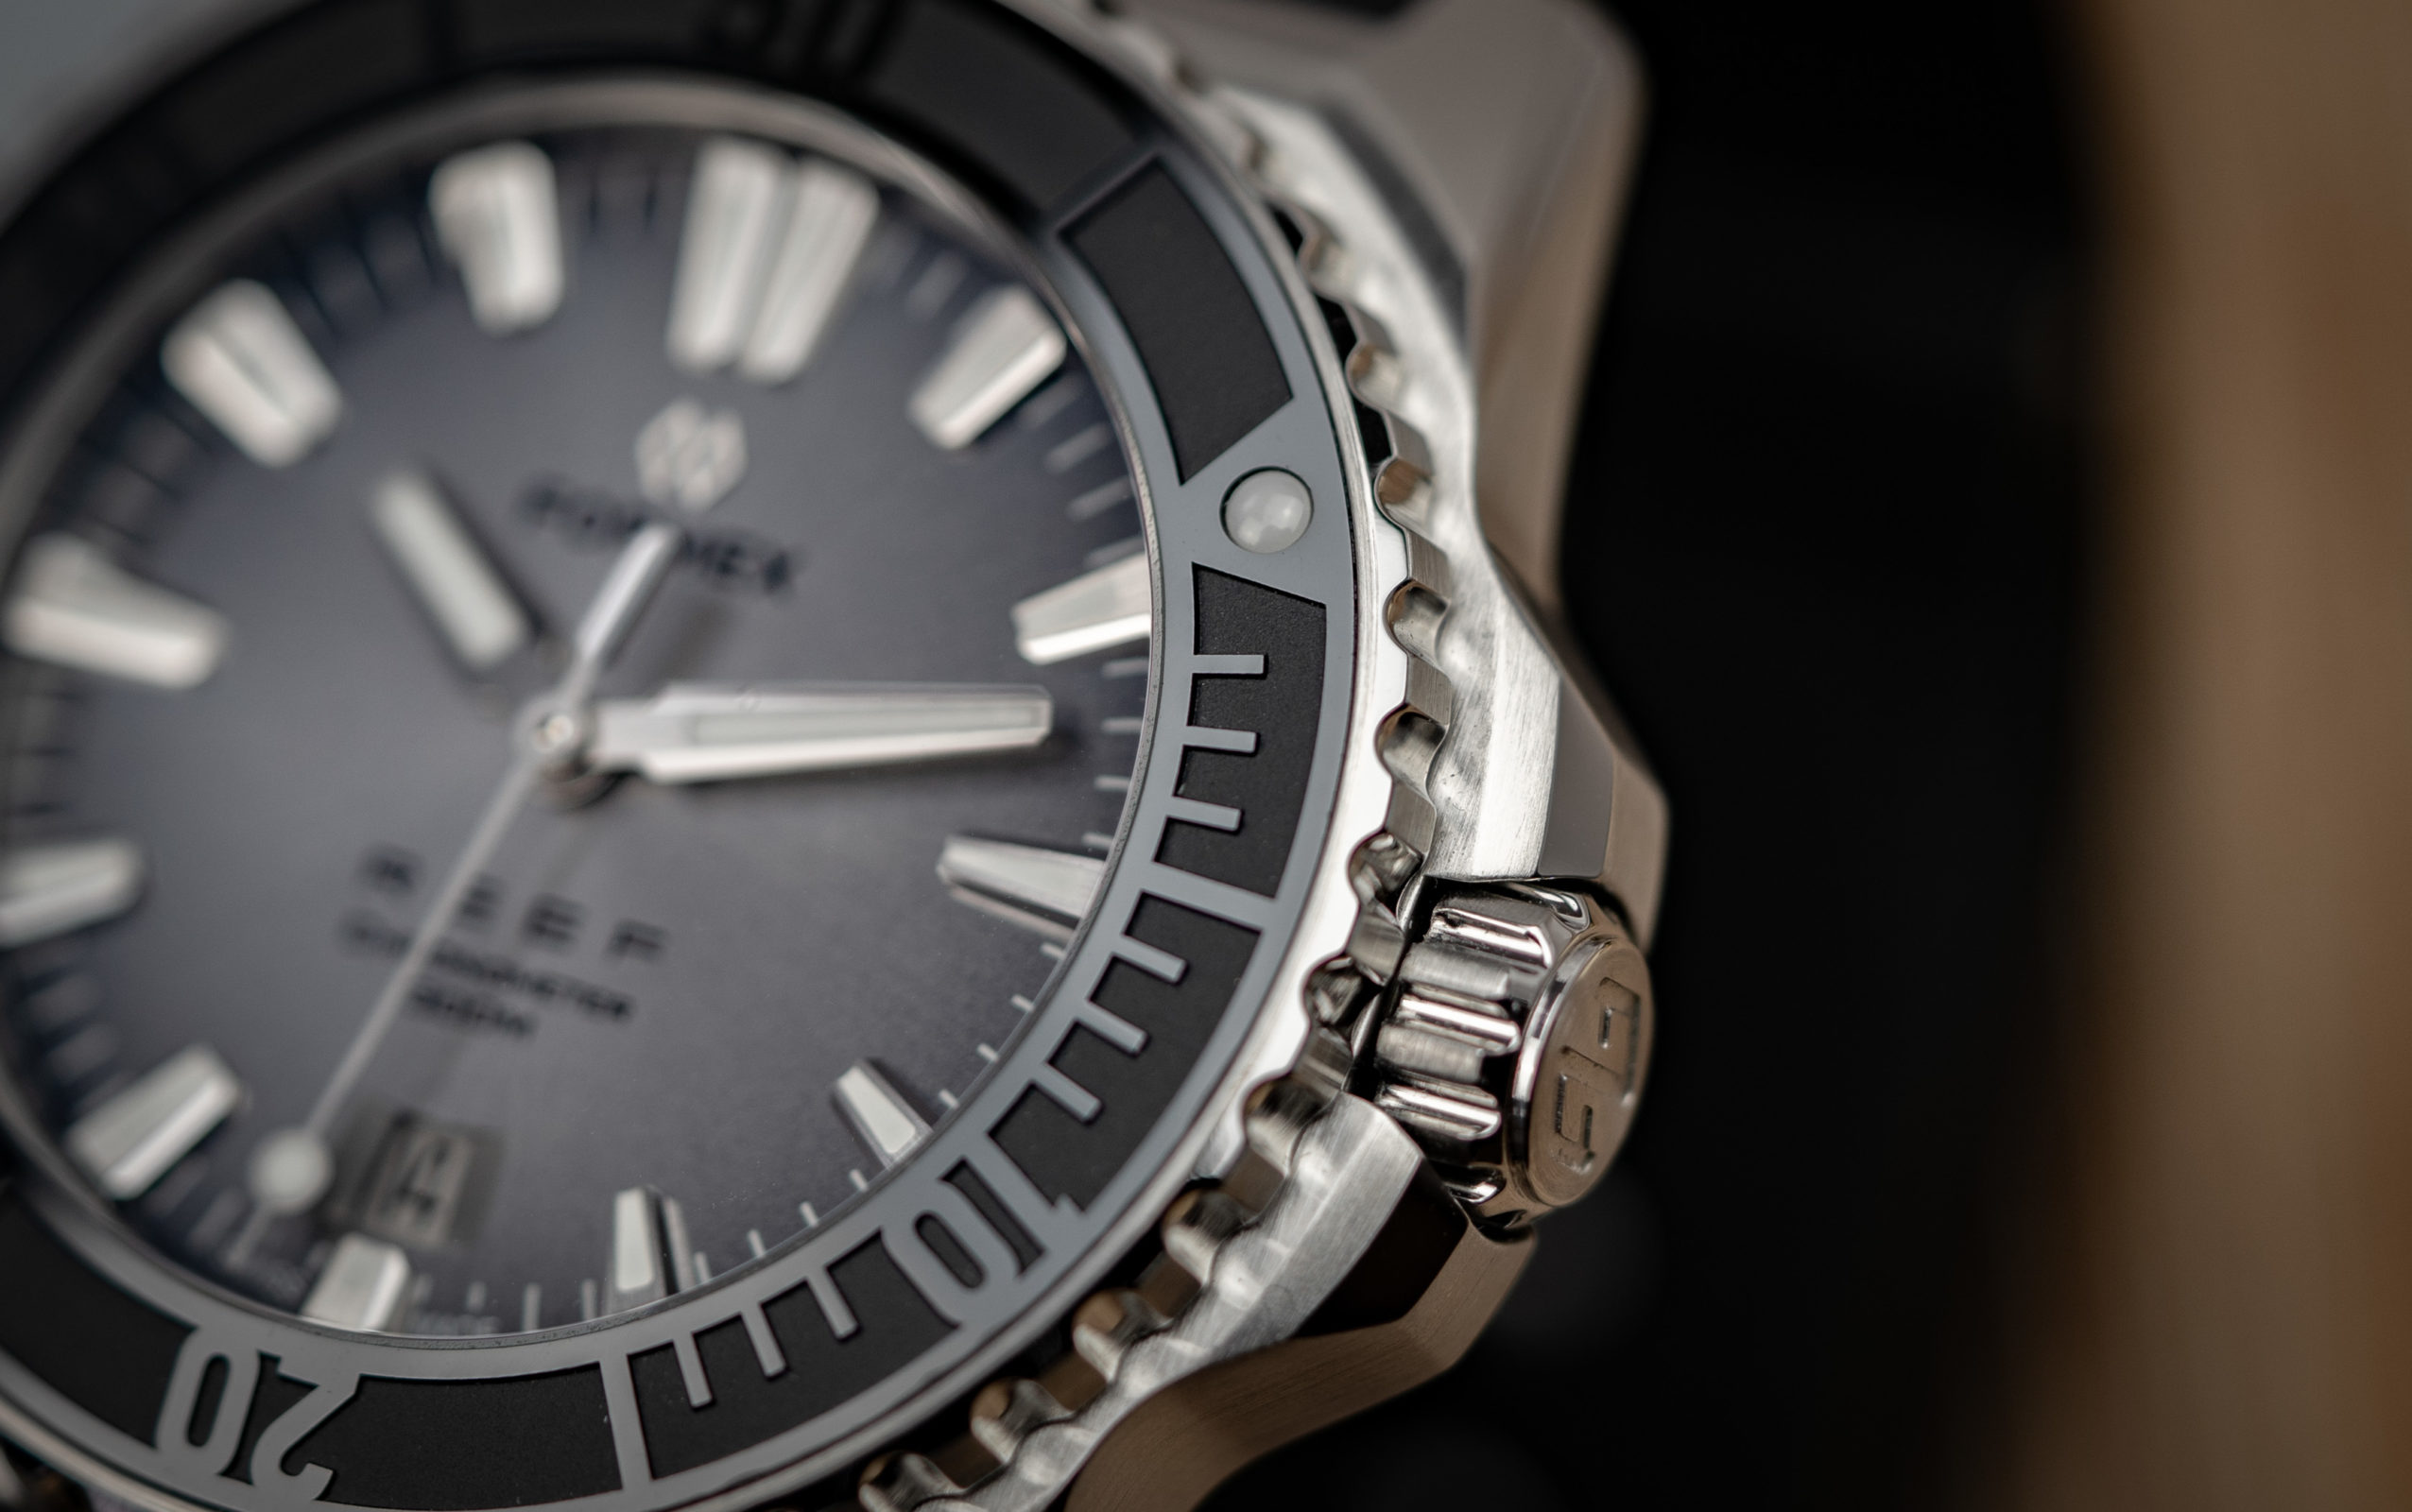 Formex-Reef-Automatik-Chronometer-300m-15